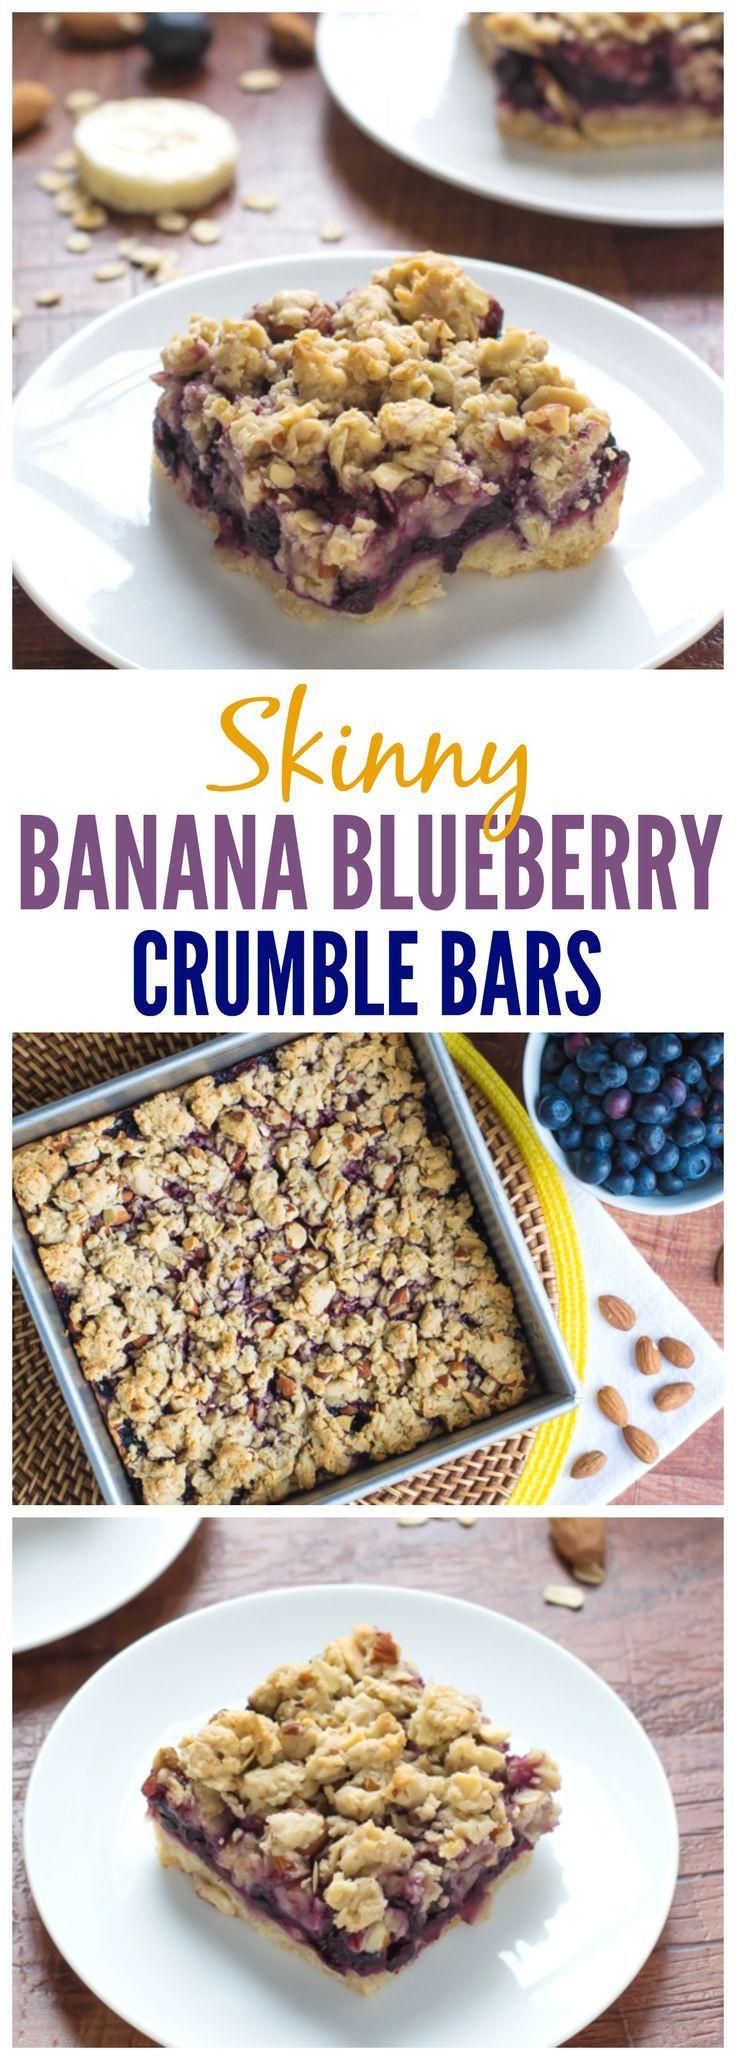 Healthy Oatmeal Breakfast Bars Recipe Easy  25 best ideas about Blueberry Oatmeal Bars on Pinterest